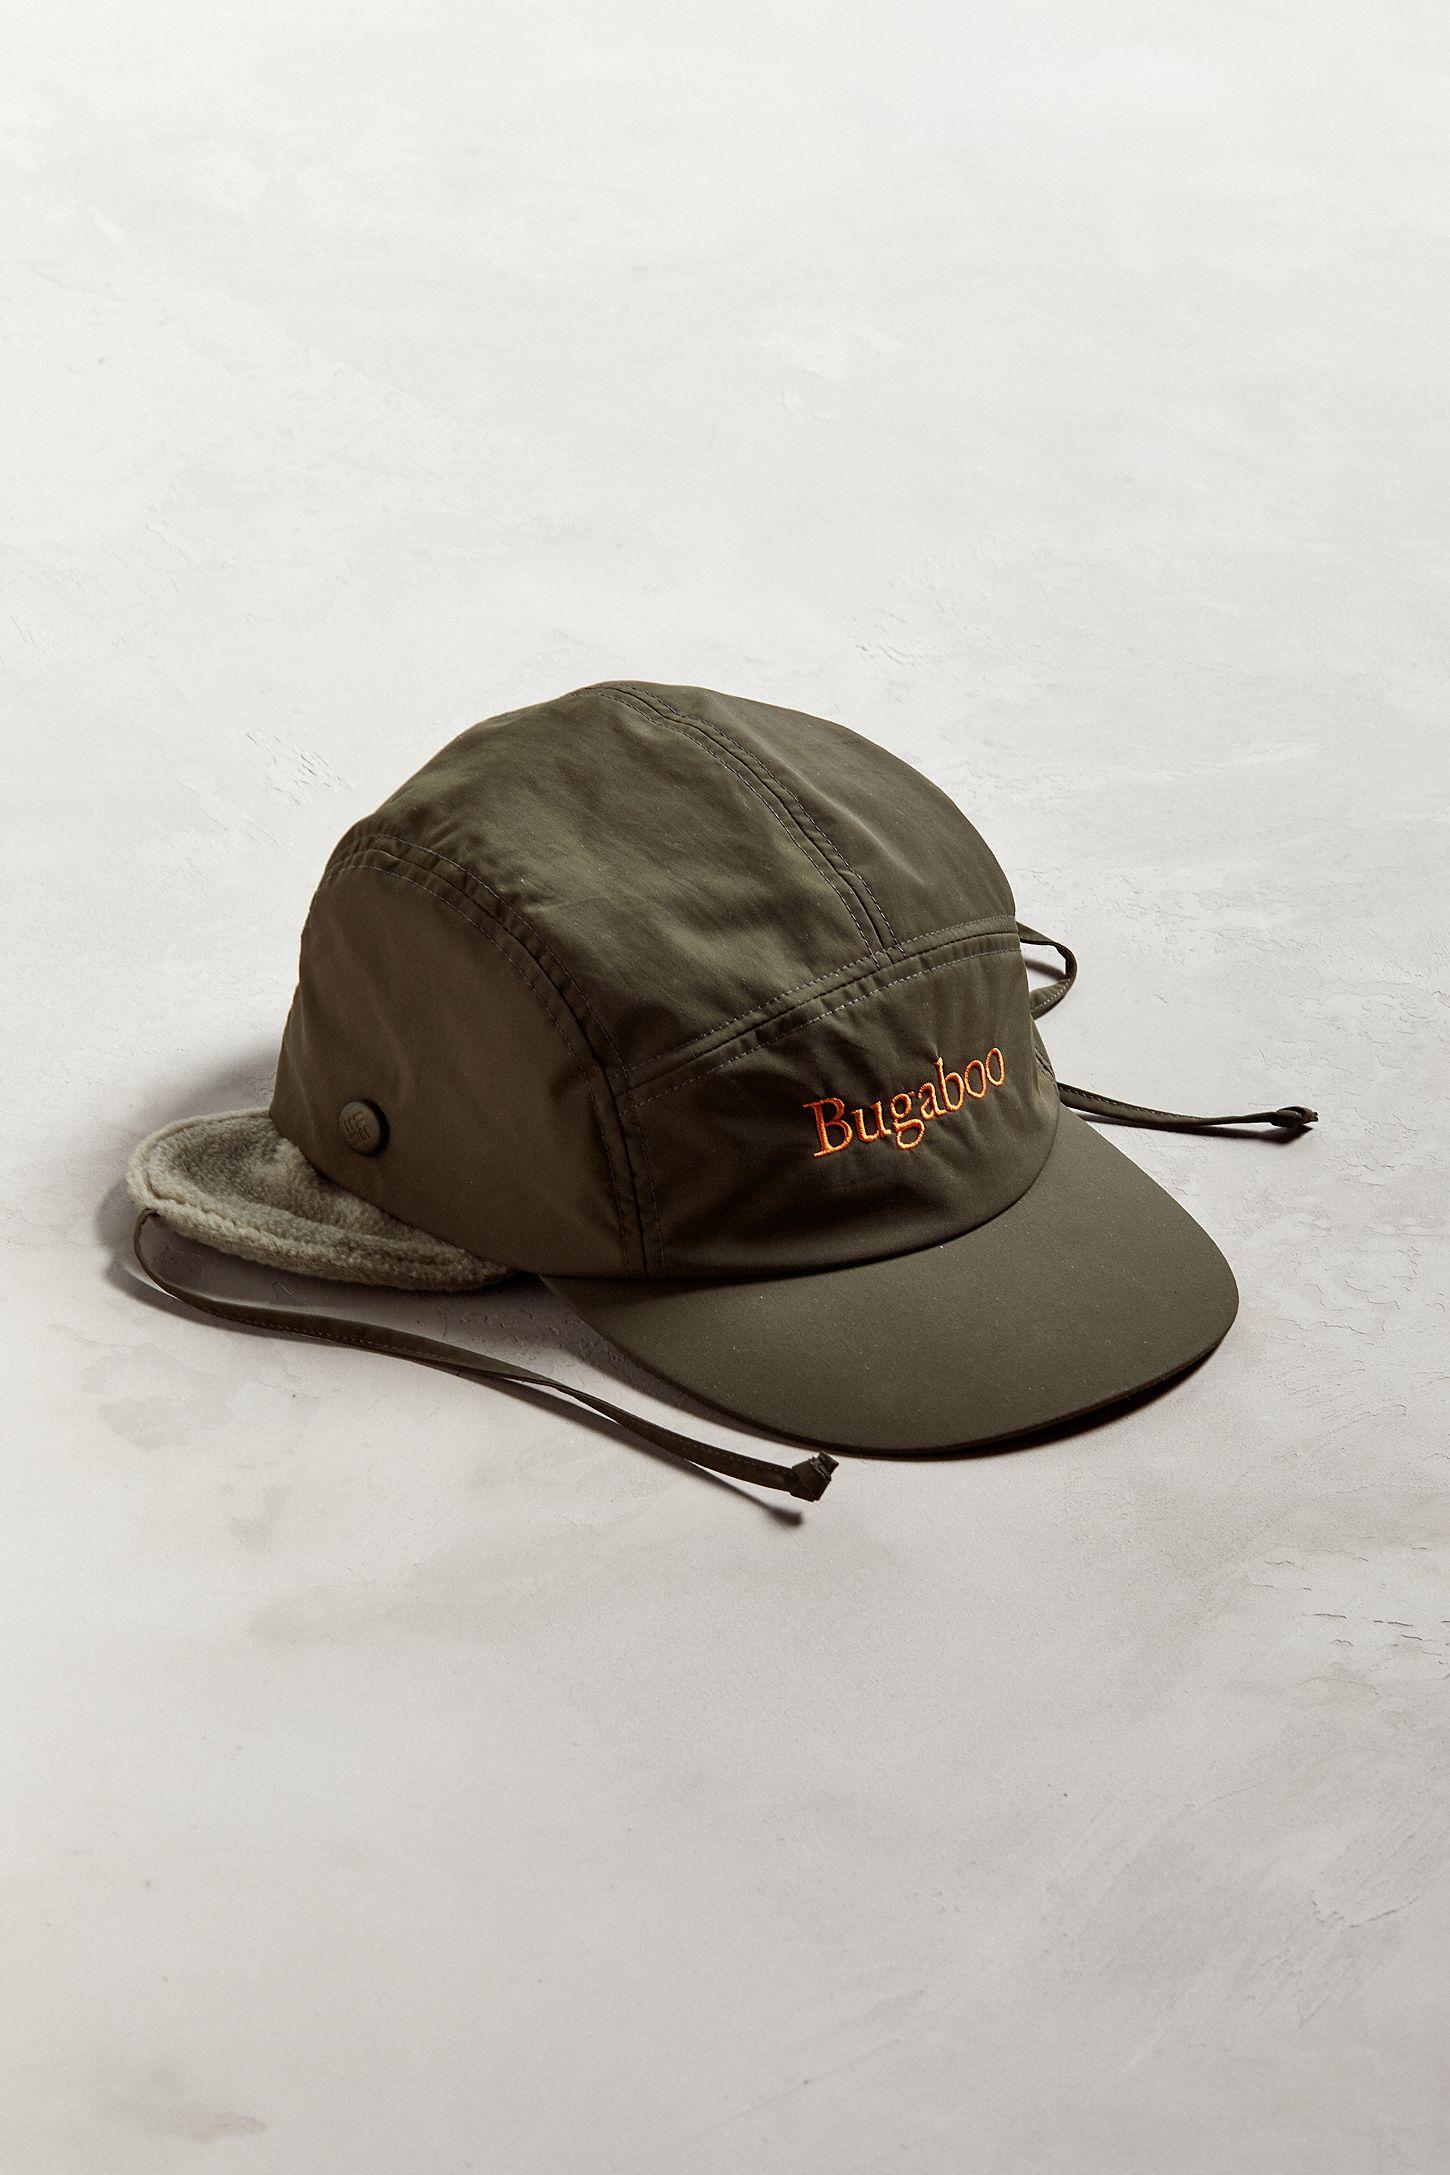 Columbia Bugaboo Reversible Fleece Camo Hat  d20031ddb1b